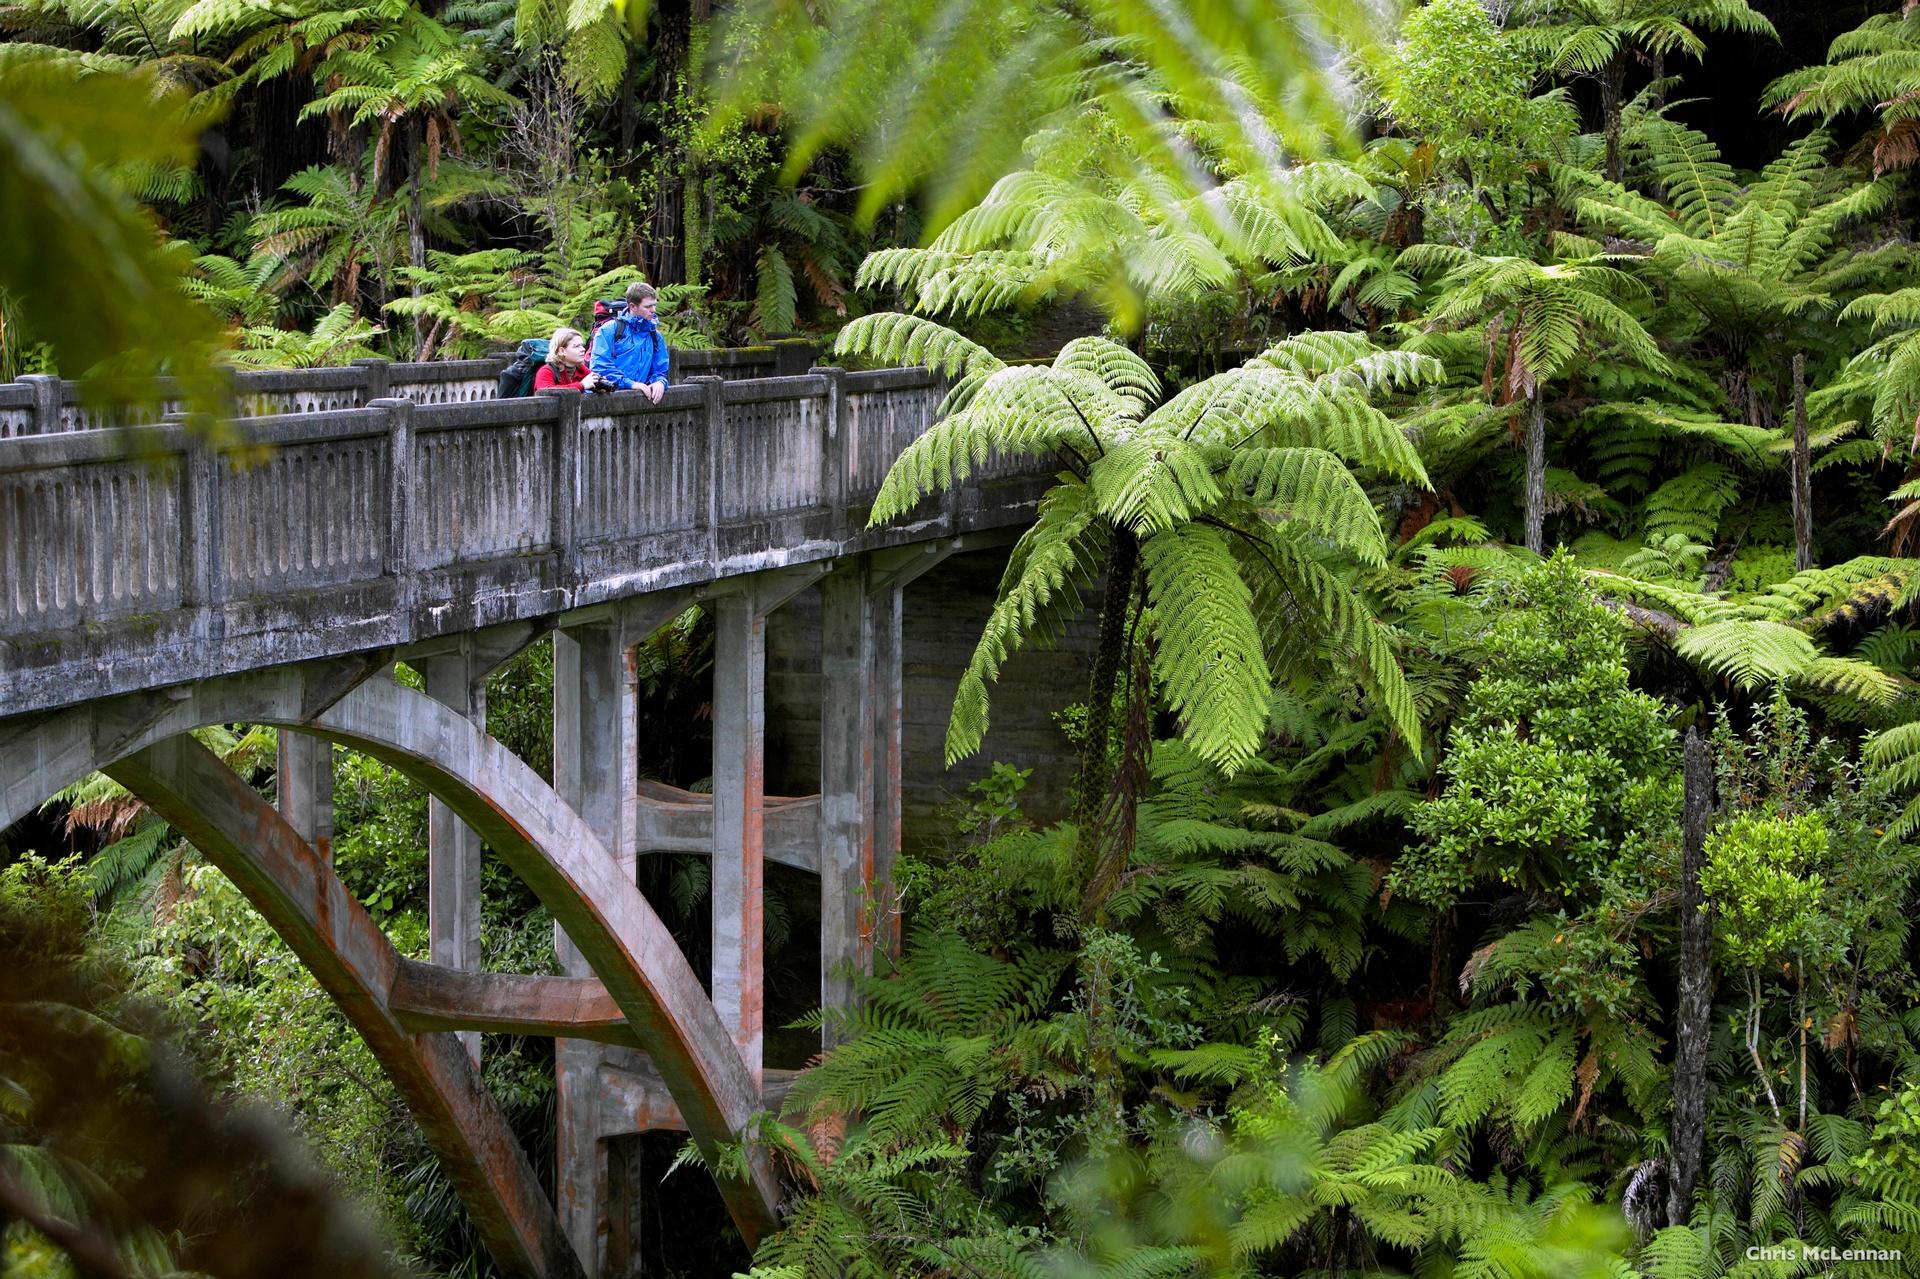 AT44-Whanganui-National-Park-Whanganui-Chris-McLennan.jpg